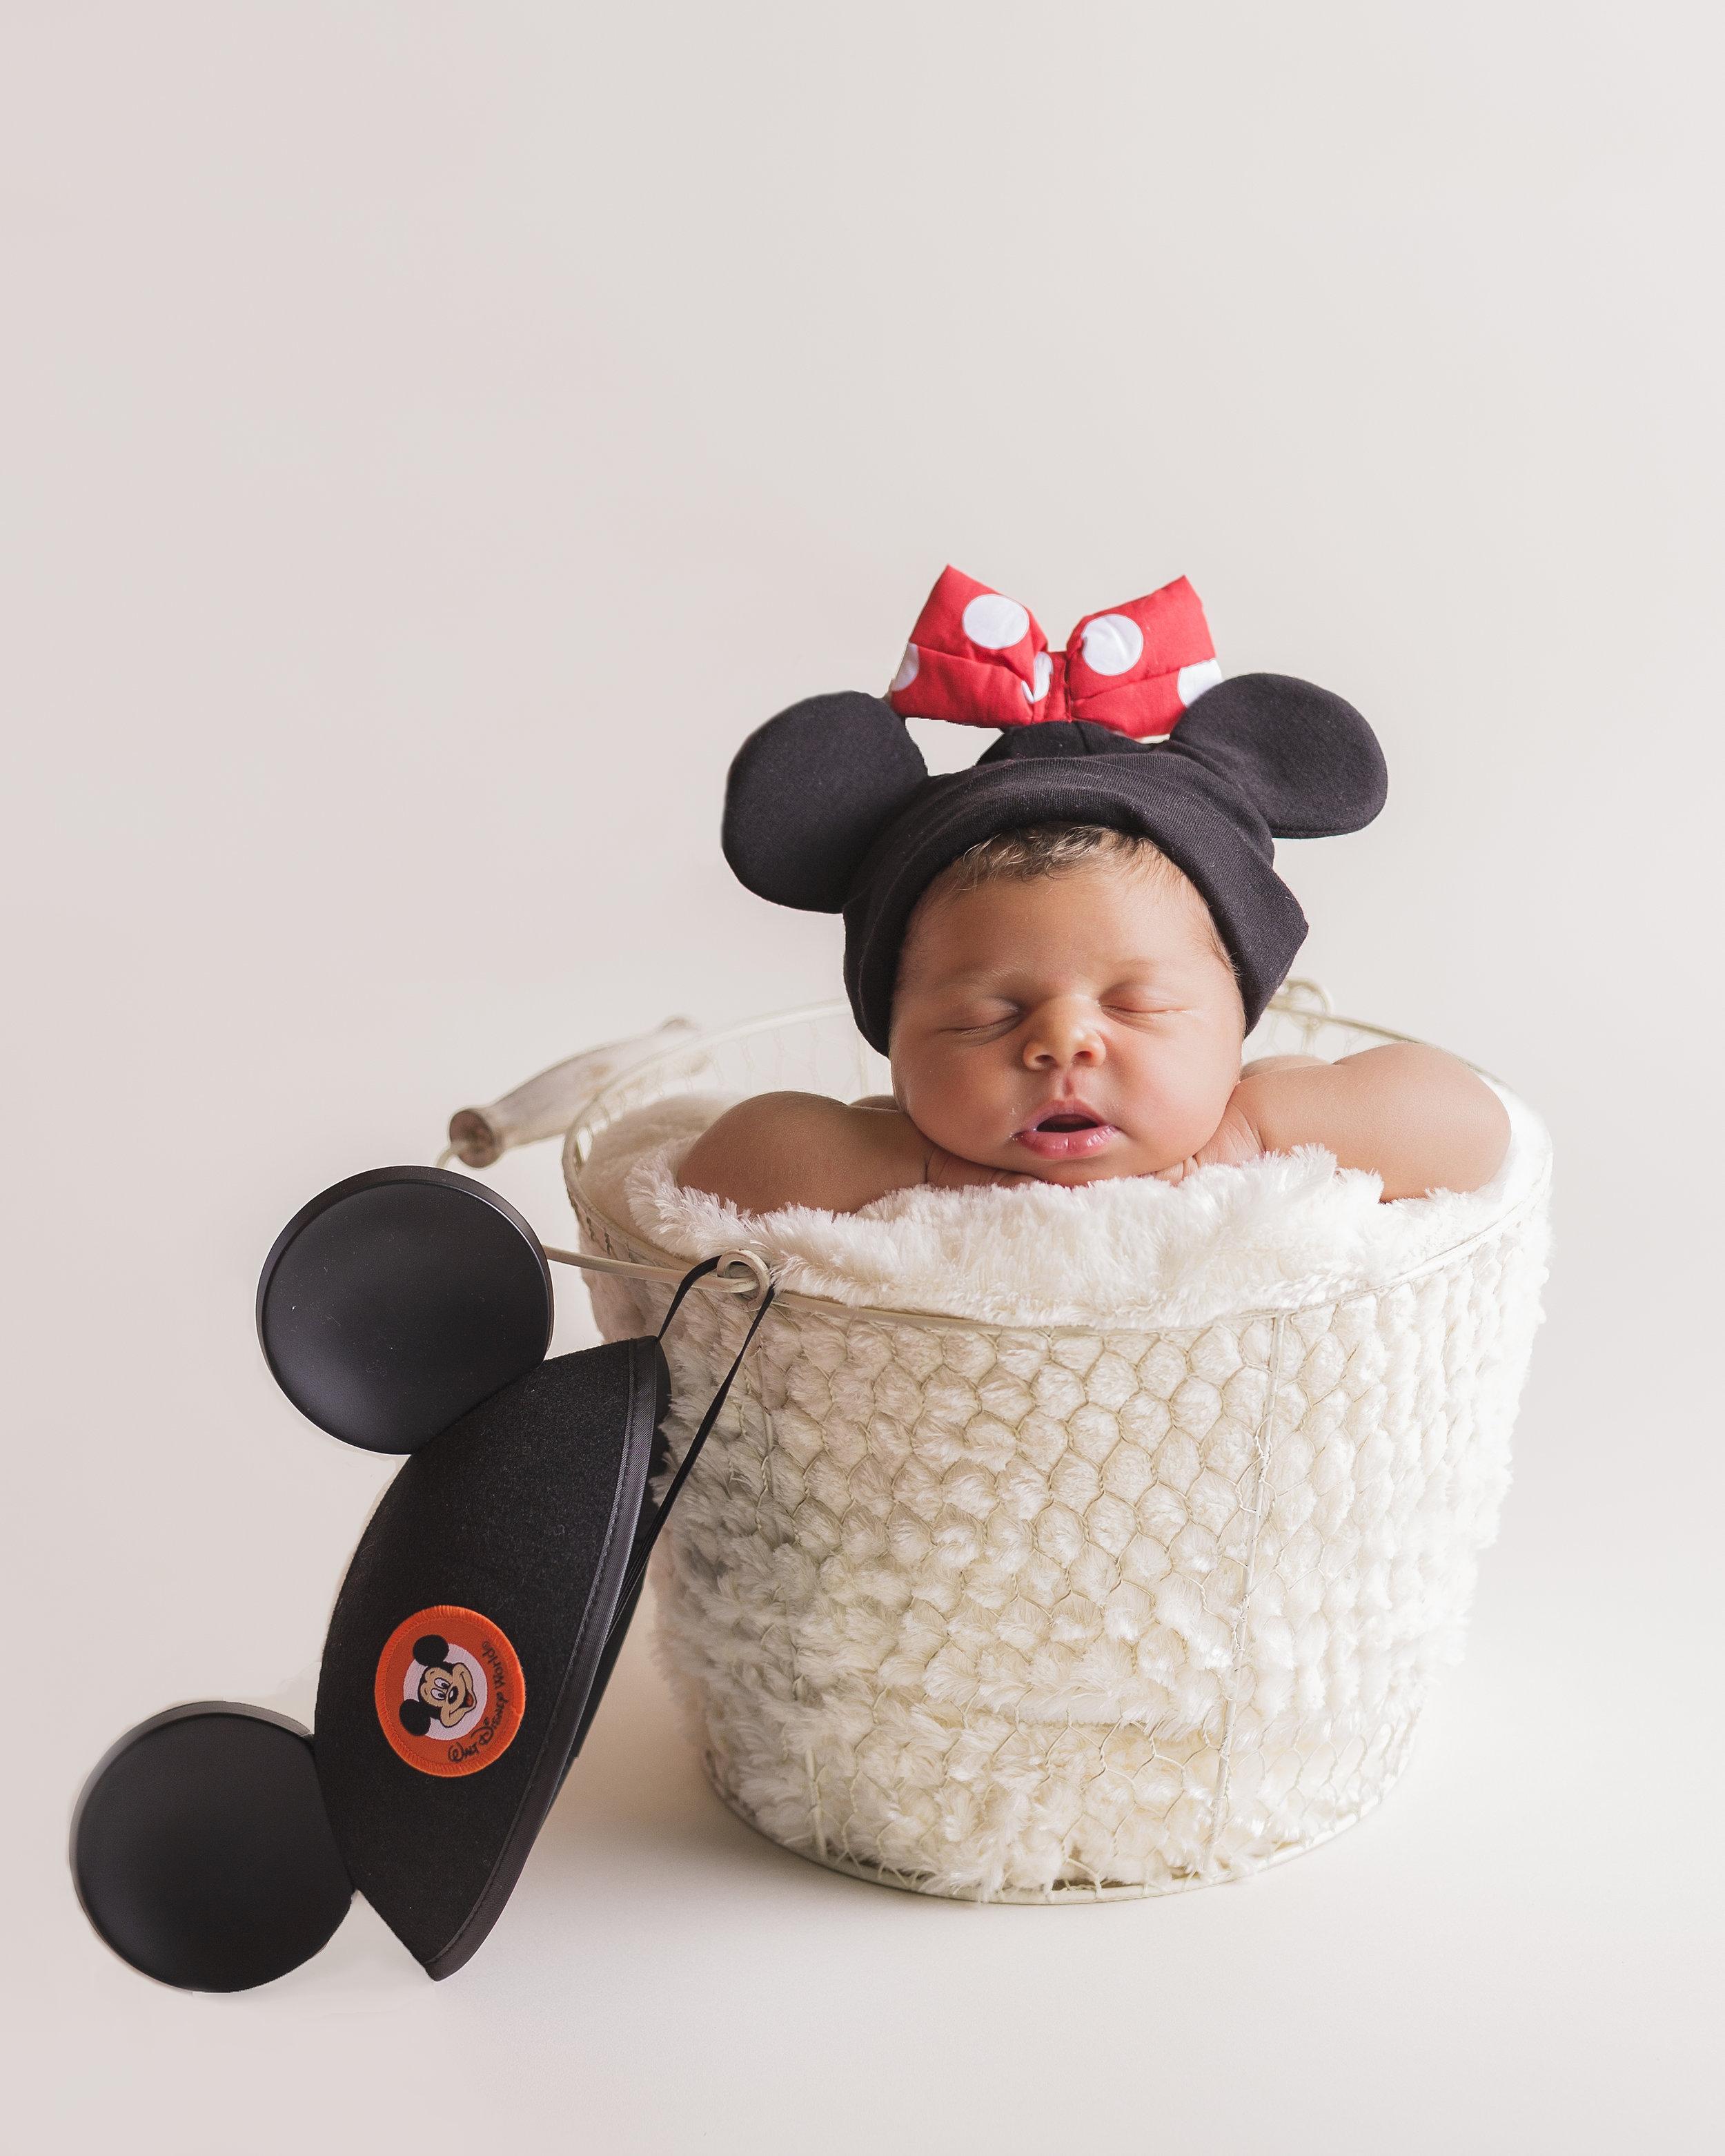 BabyRiley_Newborn-15.jpg